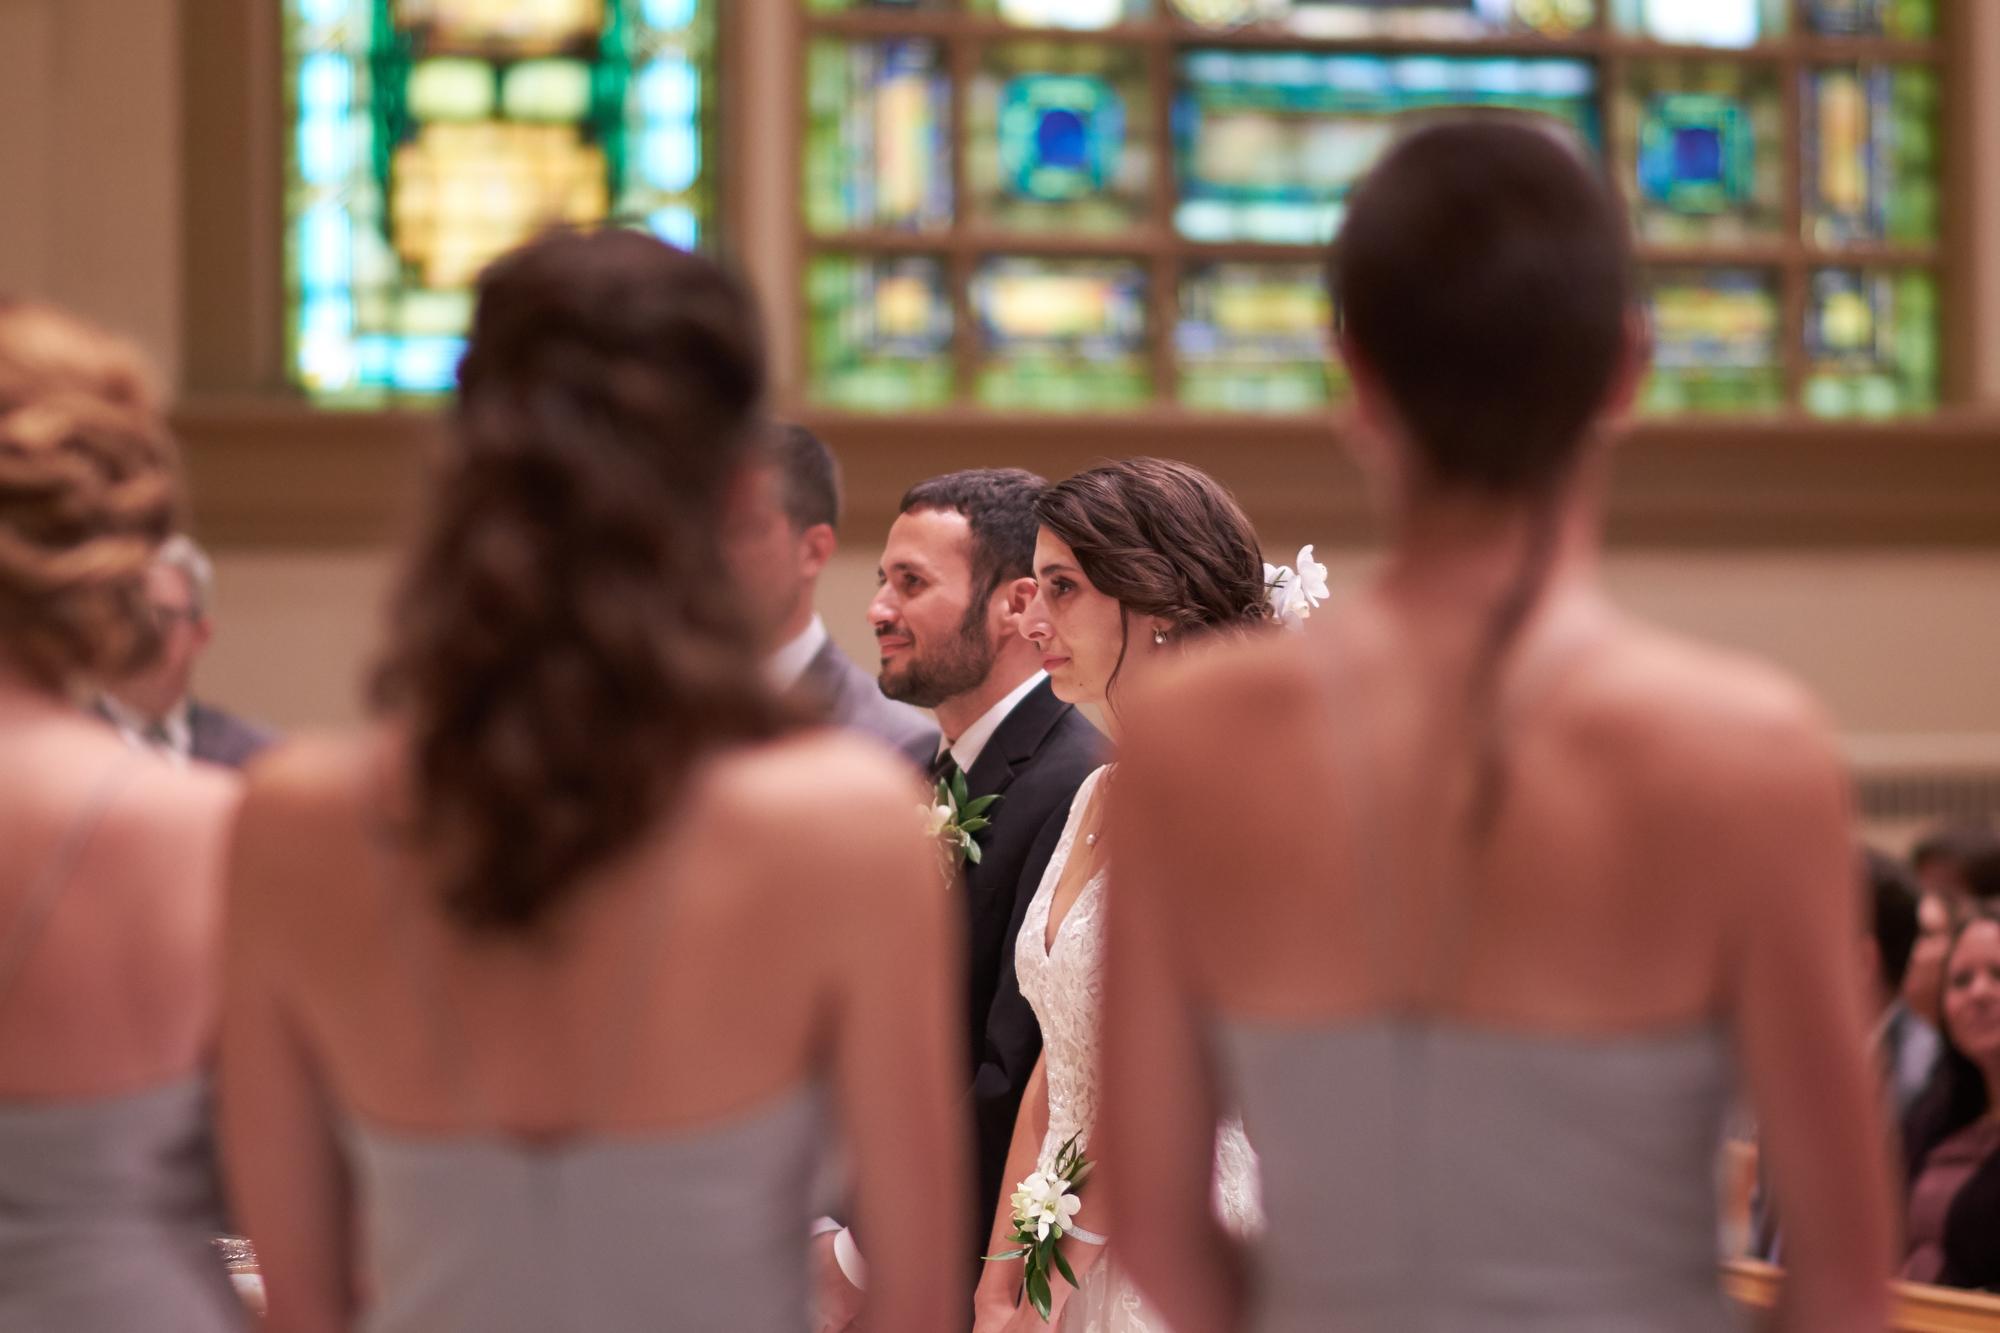 2019-07-20_15-38-44_FUJIFILM_X-T1_(c)_RH_weddingsbyryanandkate.com.JPG